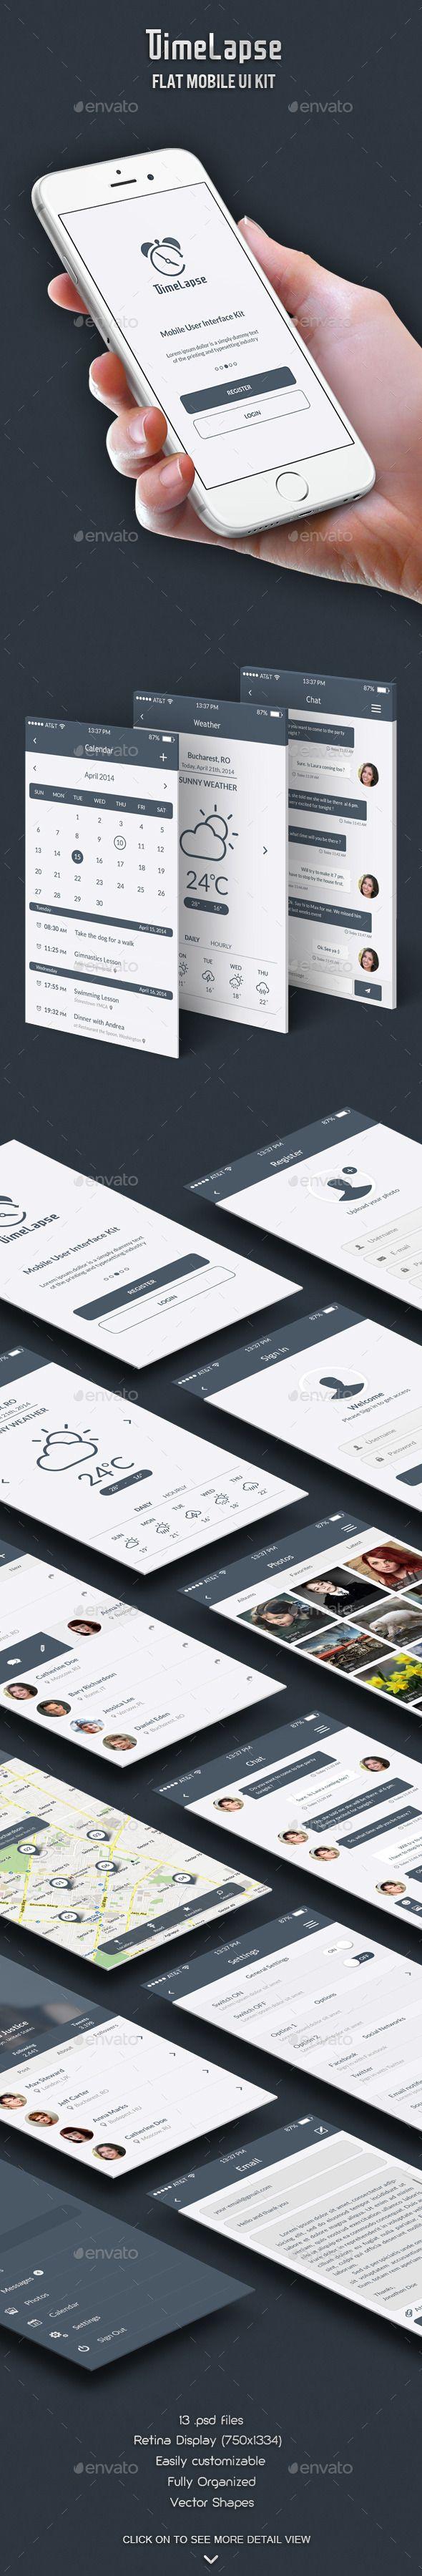 Timelapse - Flat Mobile UI Kit Template PSD #design Download: http://graphicriver.net/item/timelapse-flat-mobile-ui-kit/7516345?ref=ksioks